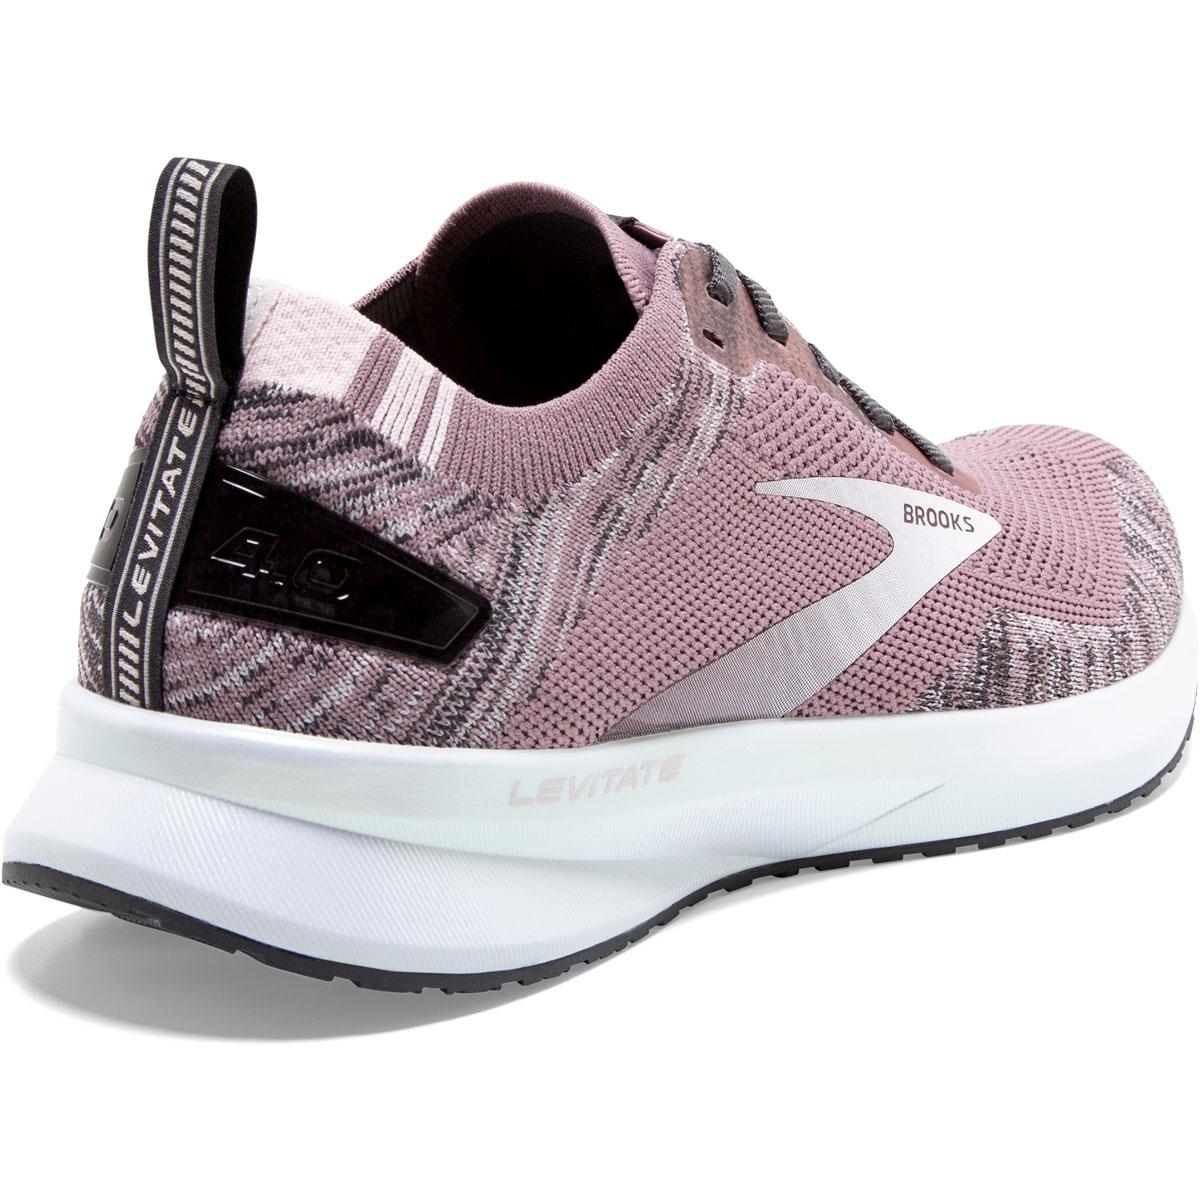 Women's Brooks Levitate 4 Running Shoe - Color: Blackened Pearl - Size: 5.5 - Width: Regular, Blackened Pearl, large, image 5